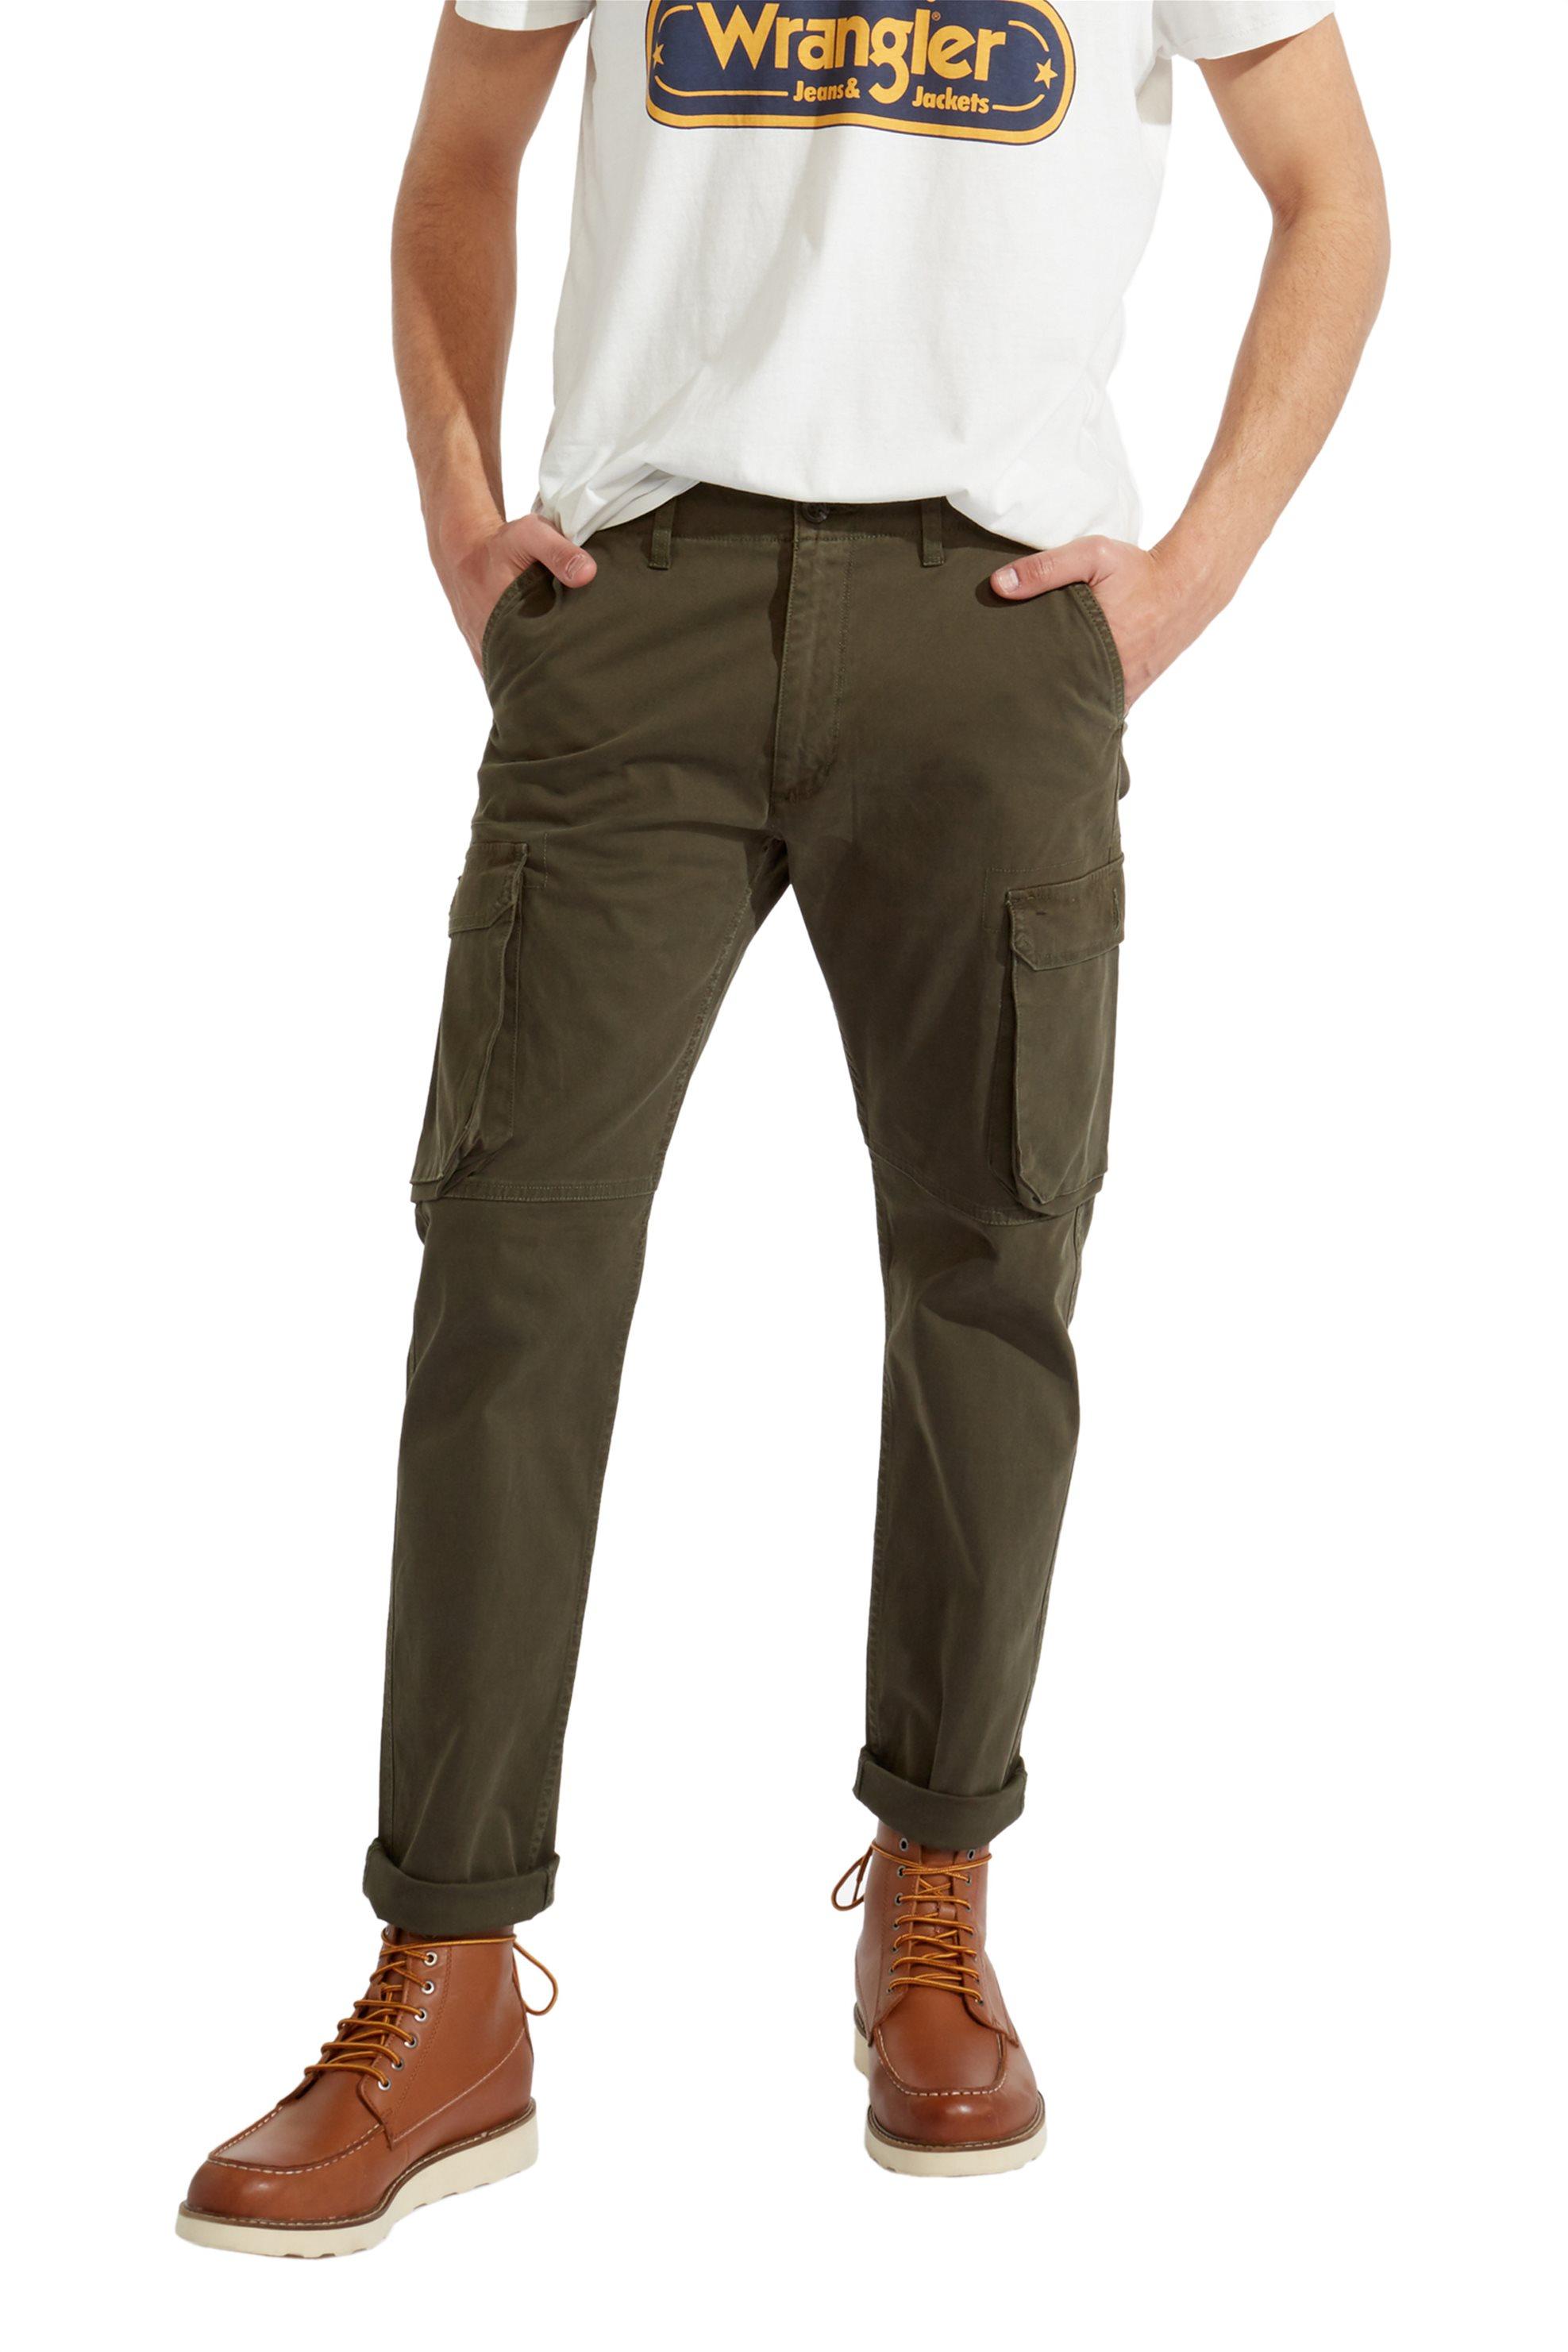 Wrangler ανδρικό παντελόνι Cargo Olive Green  - W15ESC226 - Λαδί ανδρασ   ρουχα   παντελόνια   cargo